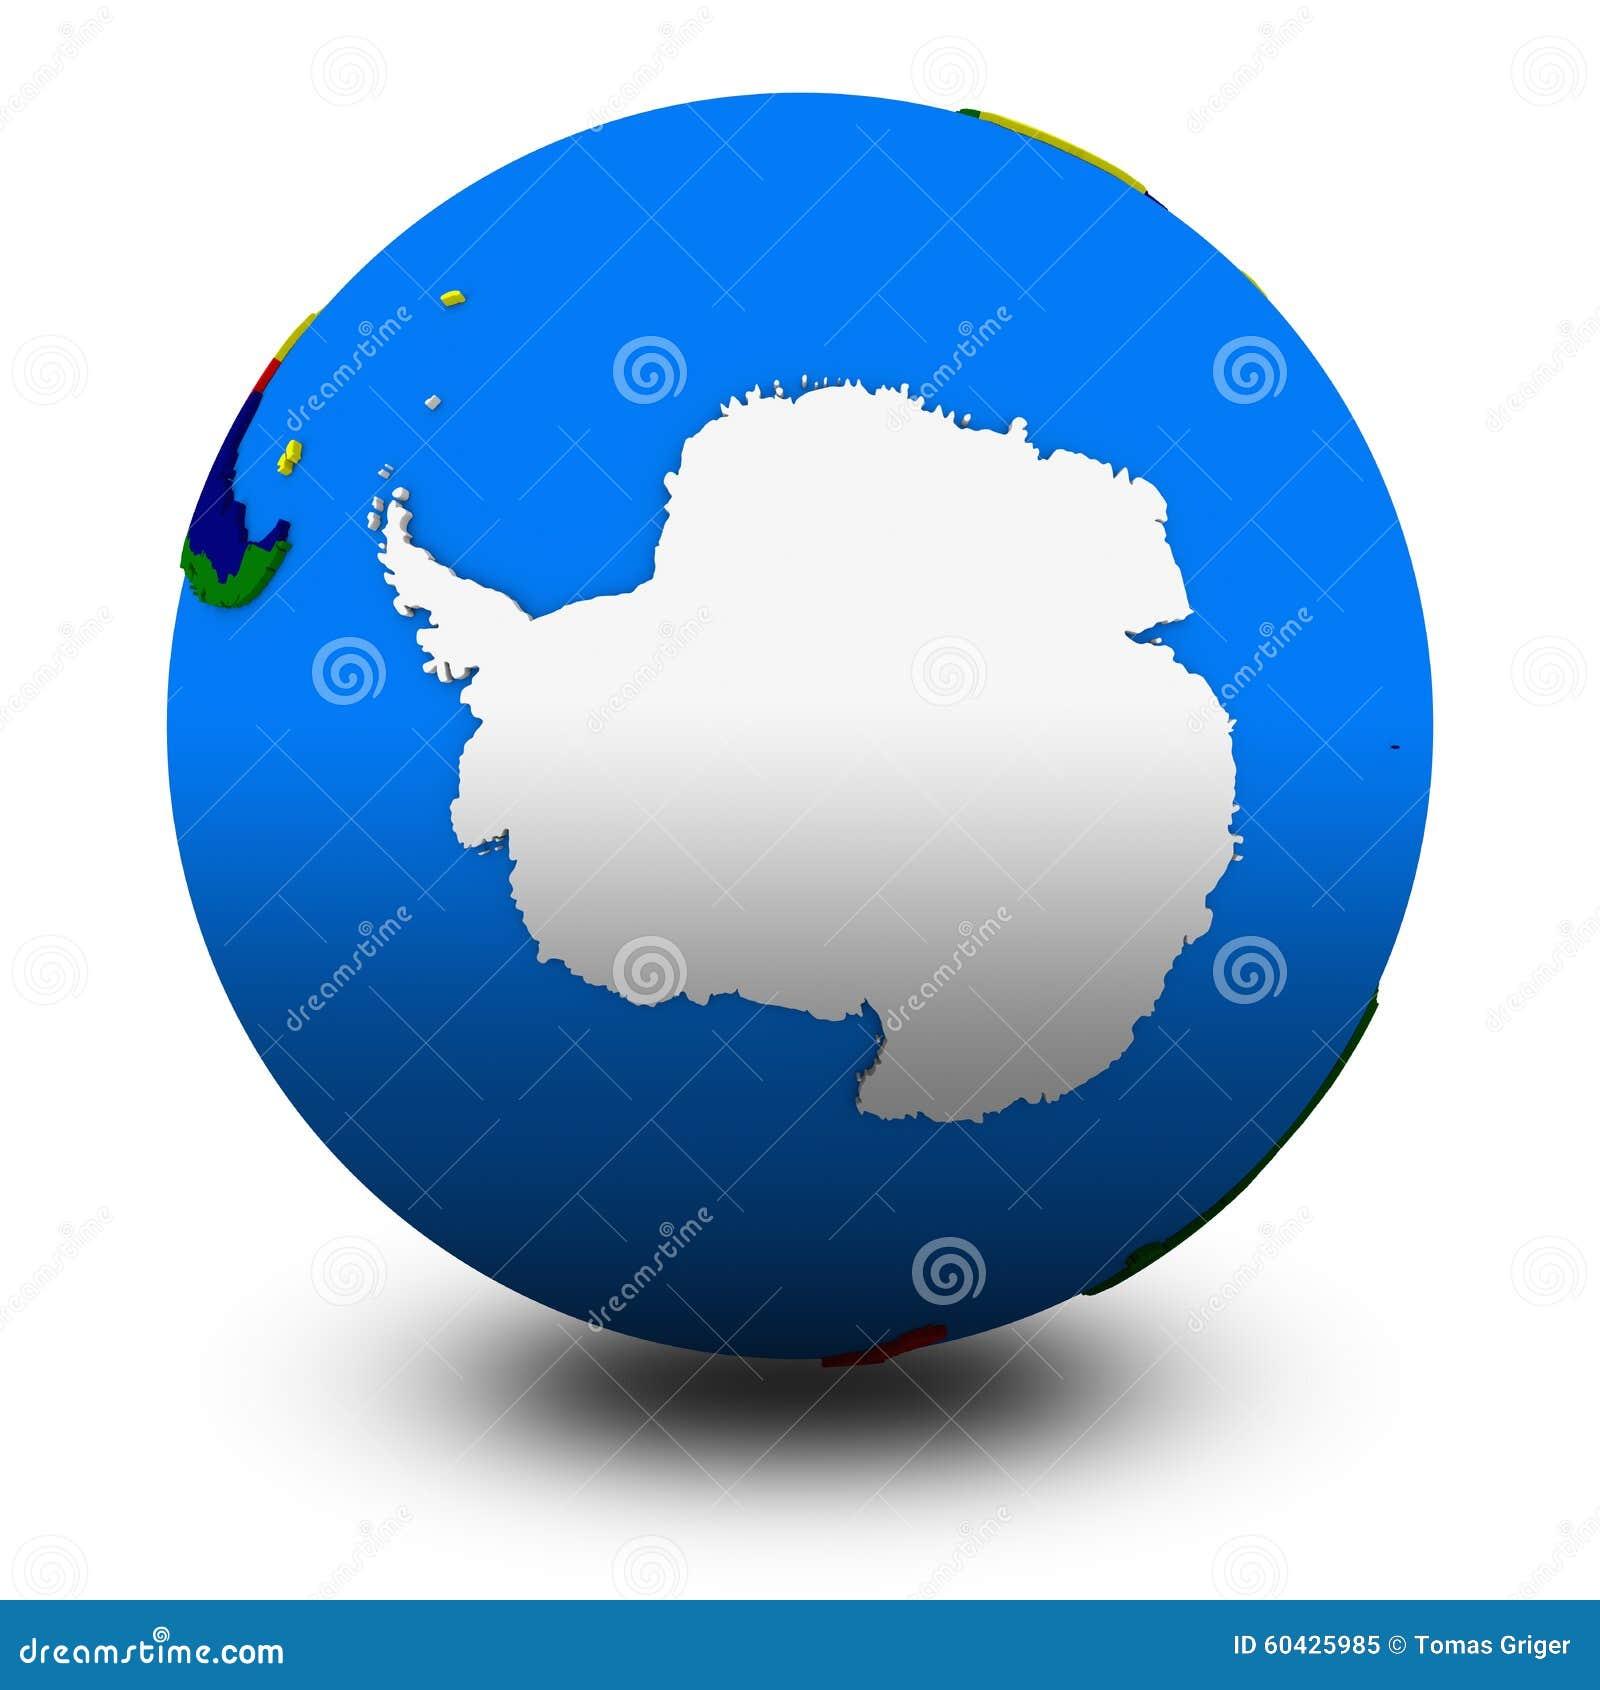 Antarctica on political globe illustration